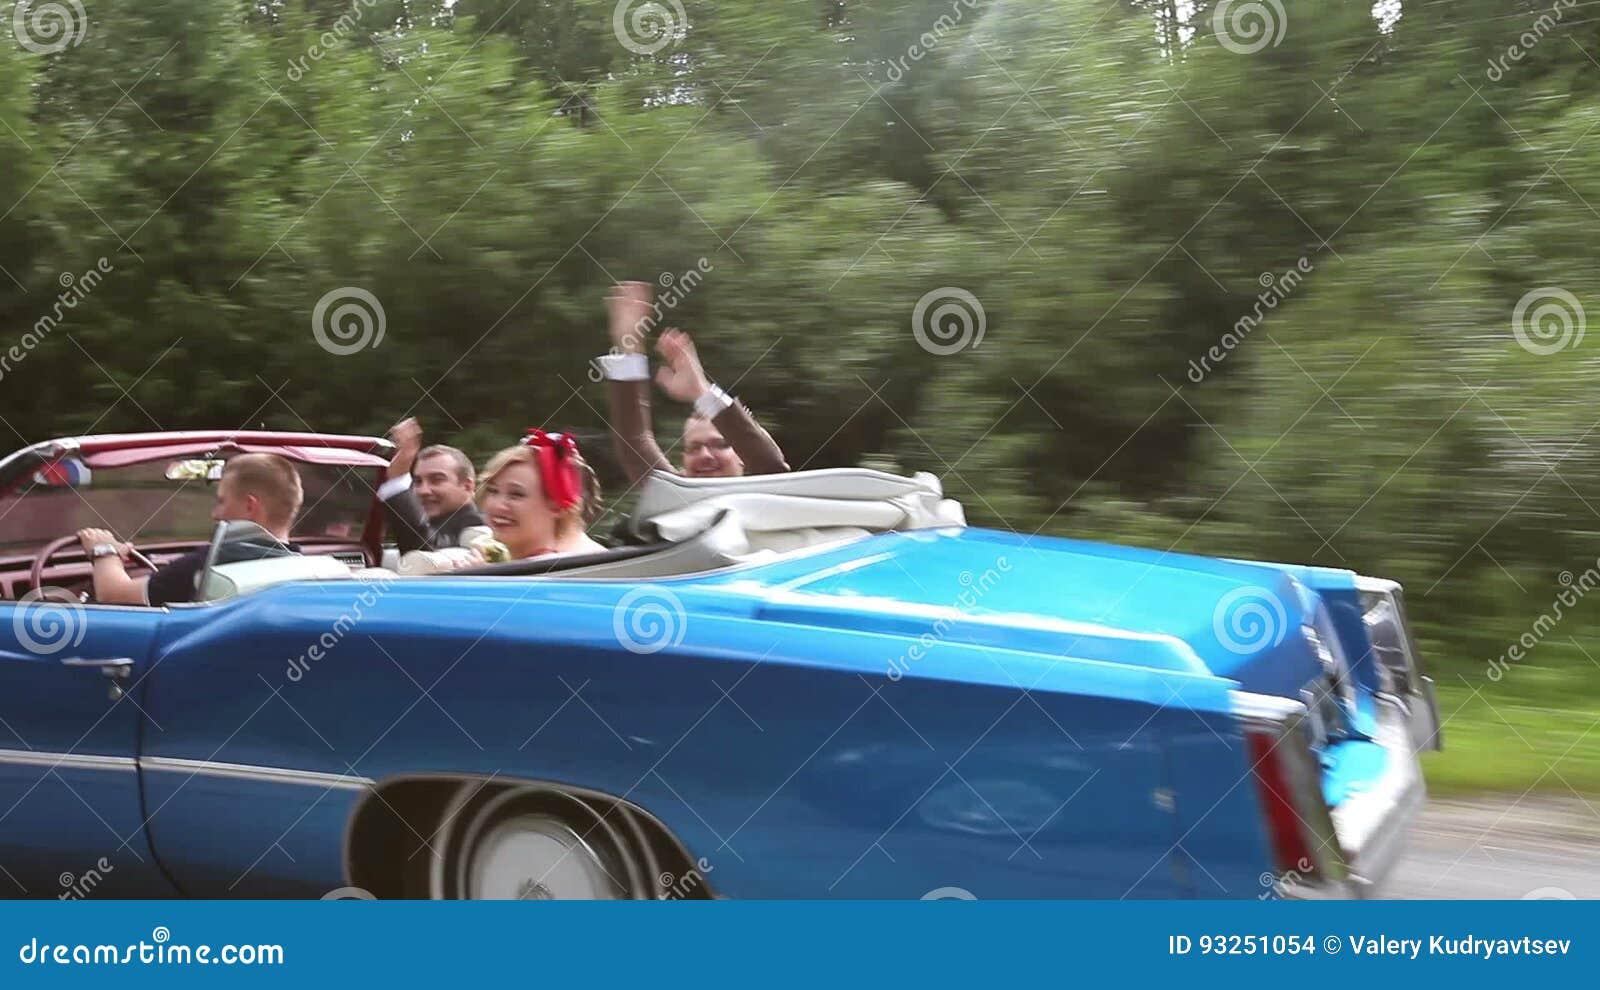 Just Married Wedding Couple Bride And Groom In Vintage Bridal Car ...